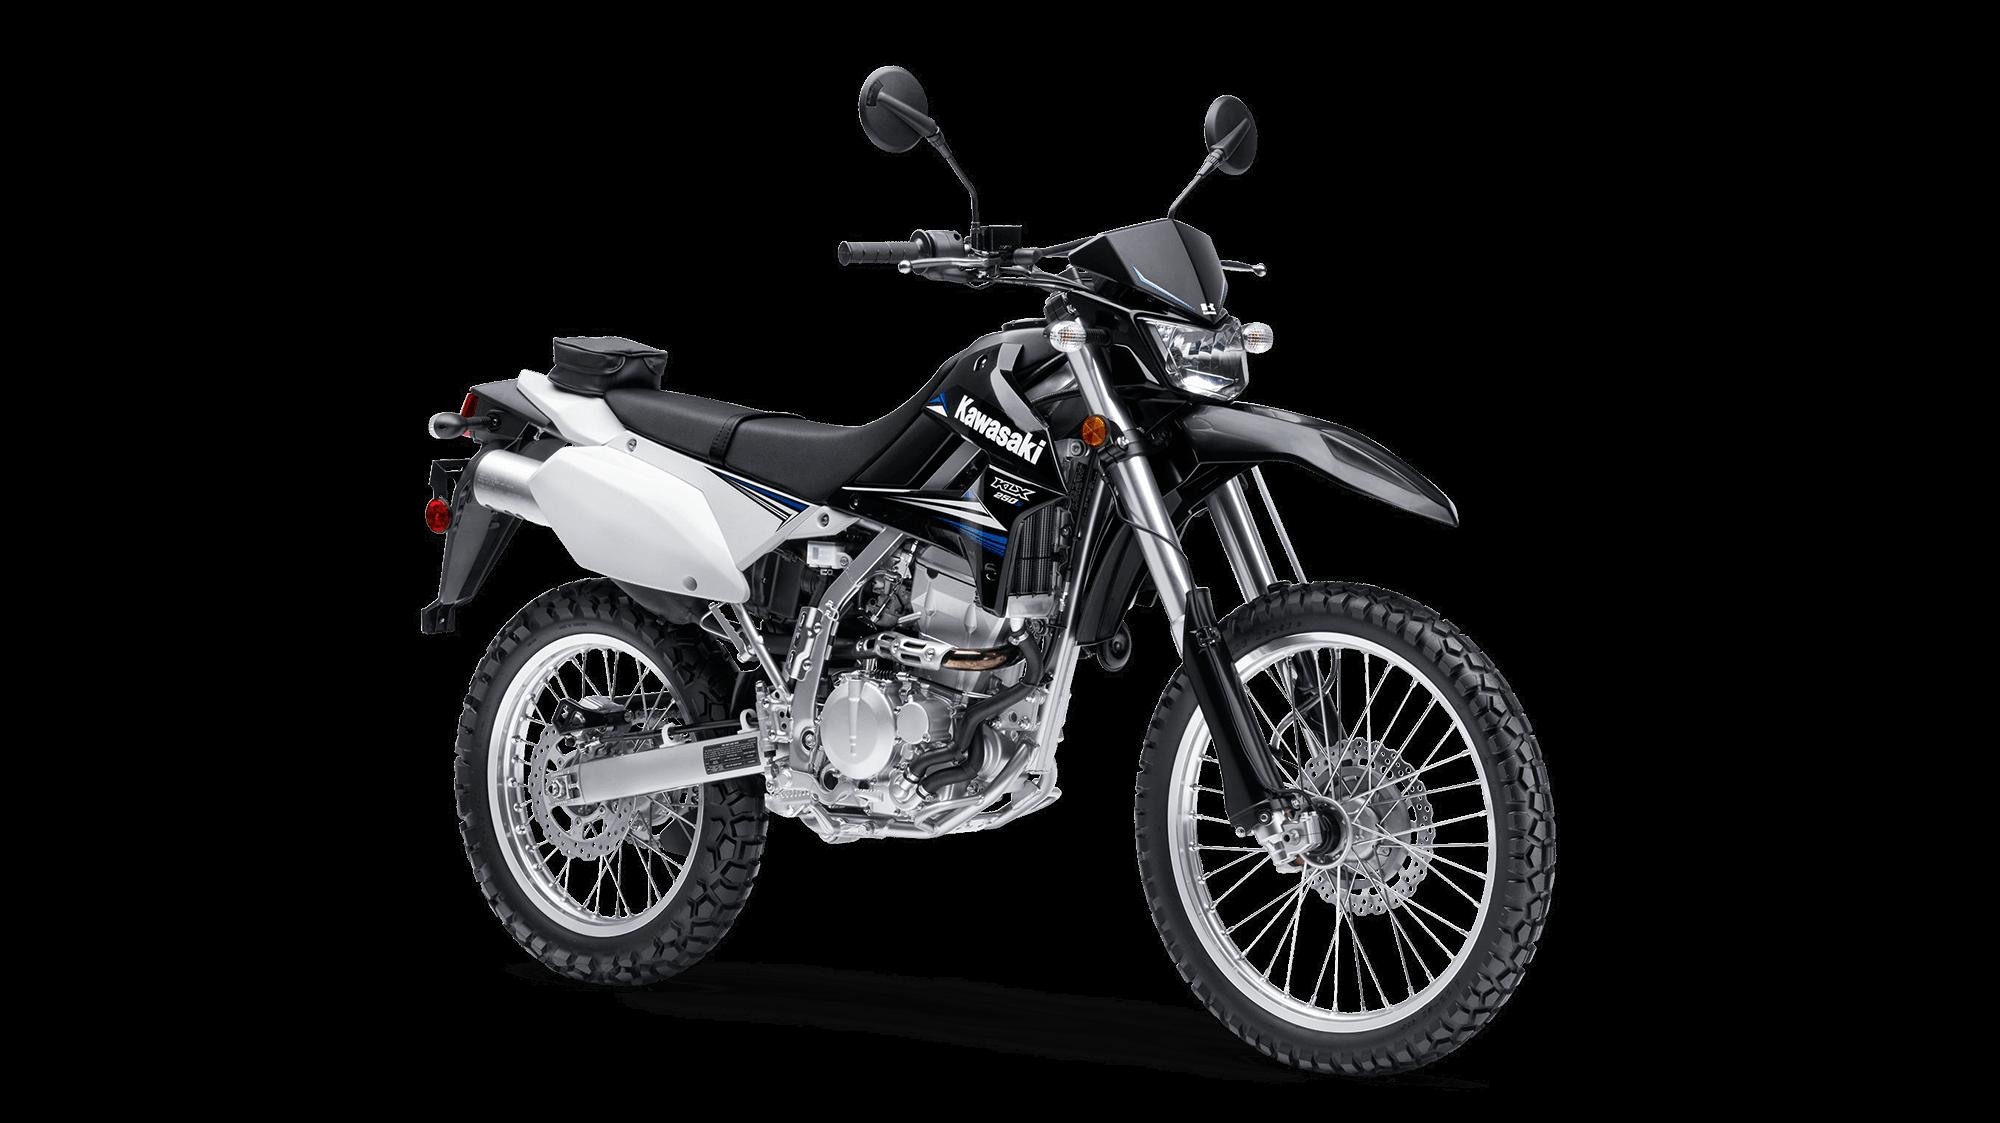 2014 KLX 250 S. Dual Purpose Motorcycle by Kawasaki. msrp